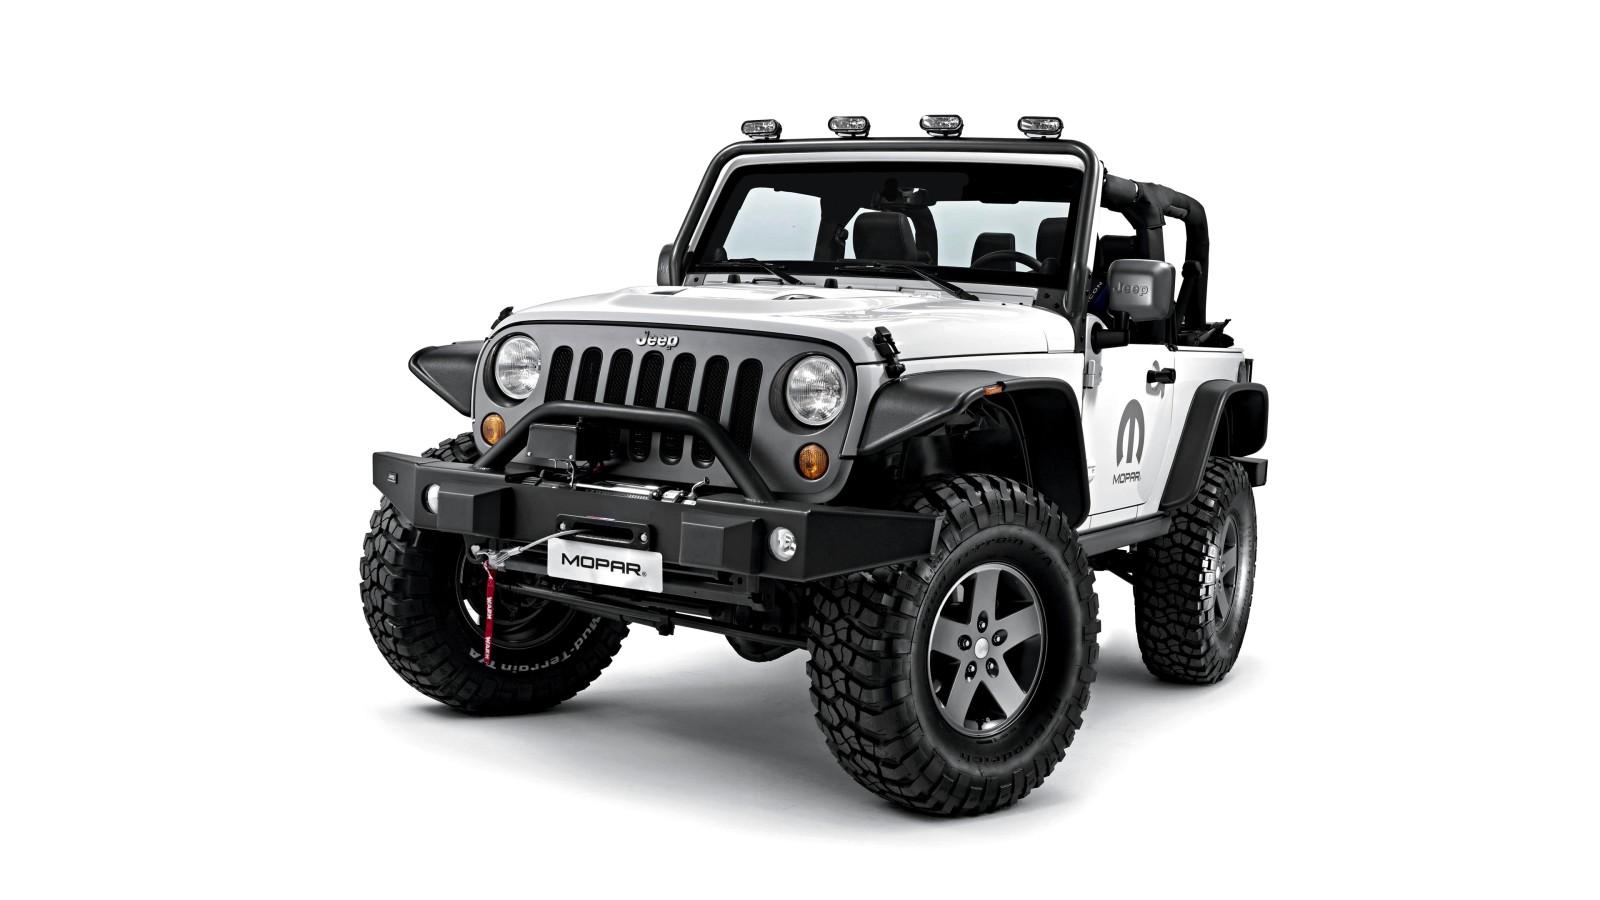 jeep wrangler hd mopar unlimited wallpapers 4k ultra jk rubicon engine kit swap 1080 2160 v8 wallpapersafari resolution chevy resolutions